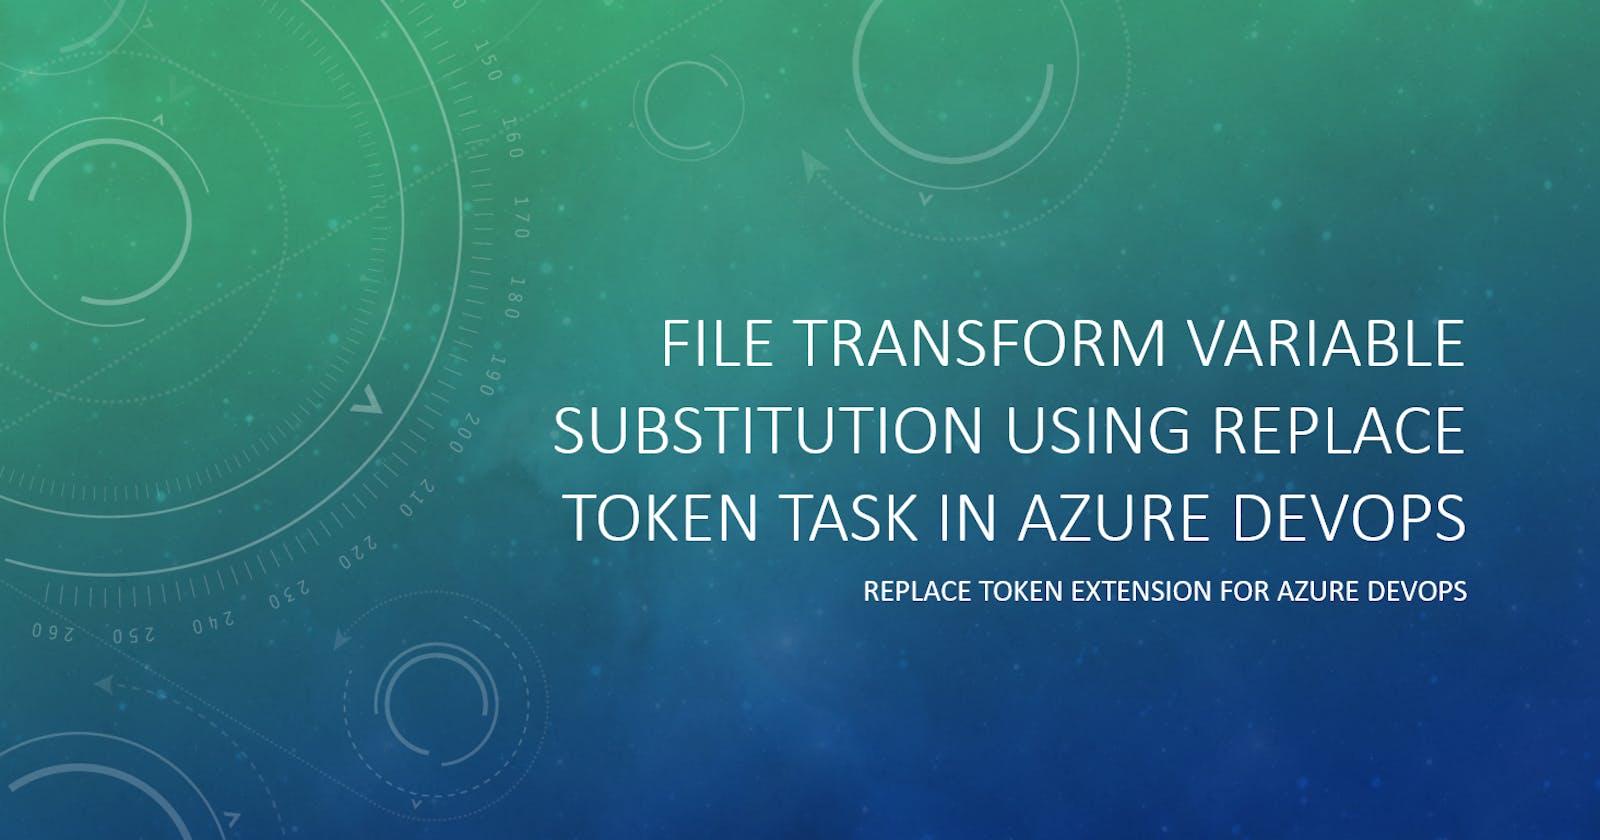 File Transform Variable Substitution using replace token task in Azure Devops